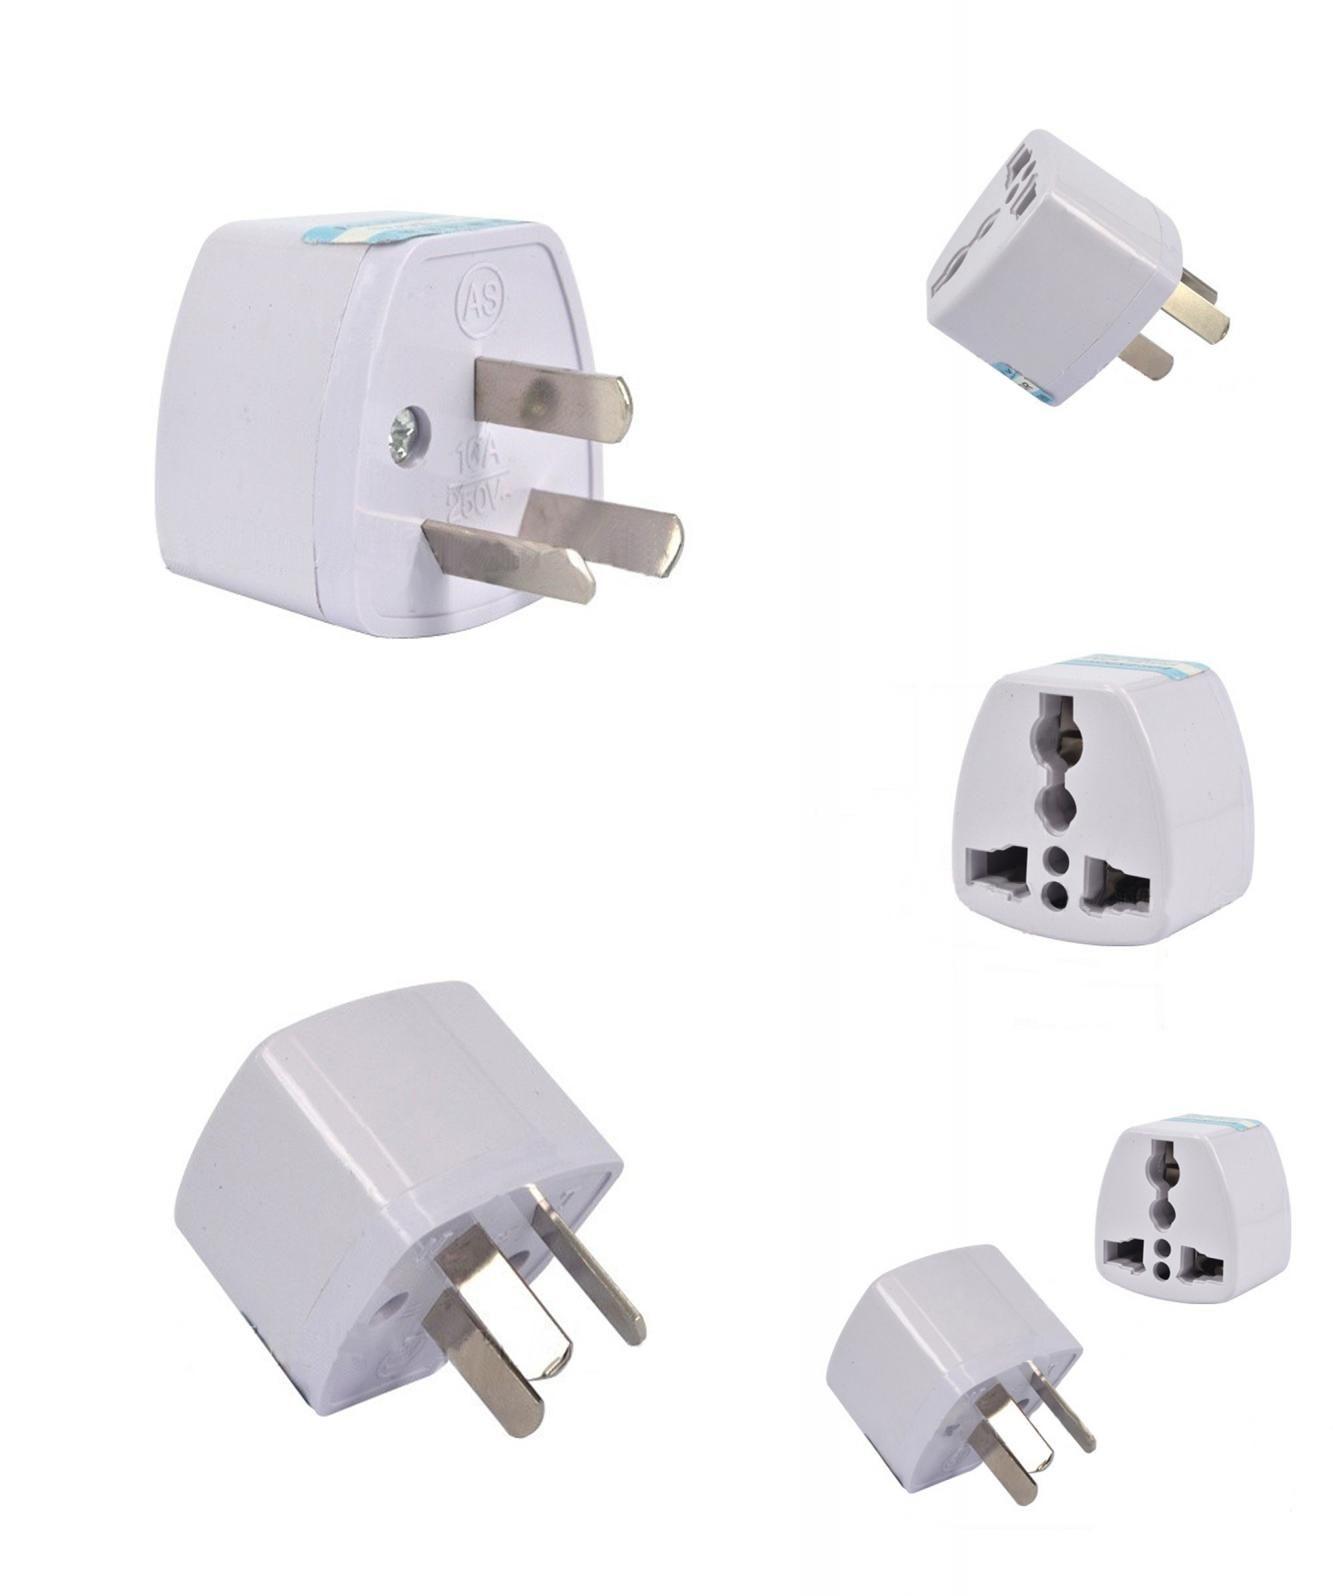 Travel Plug Adapter Adaptor 3 Pin Au